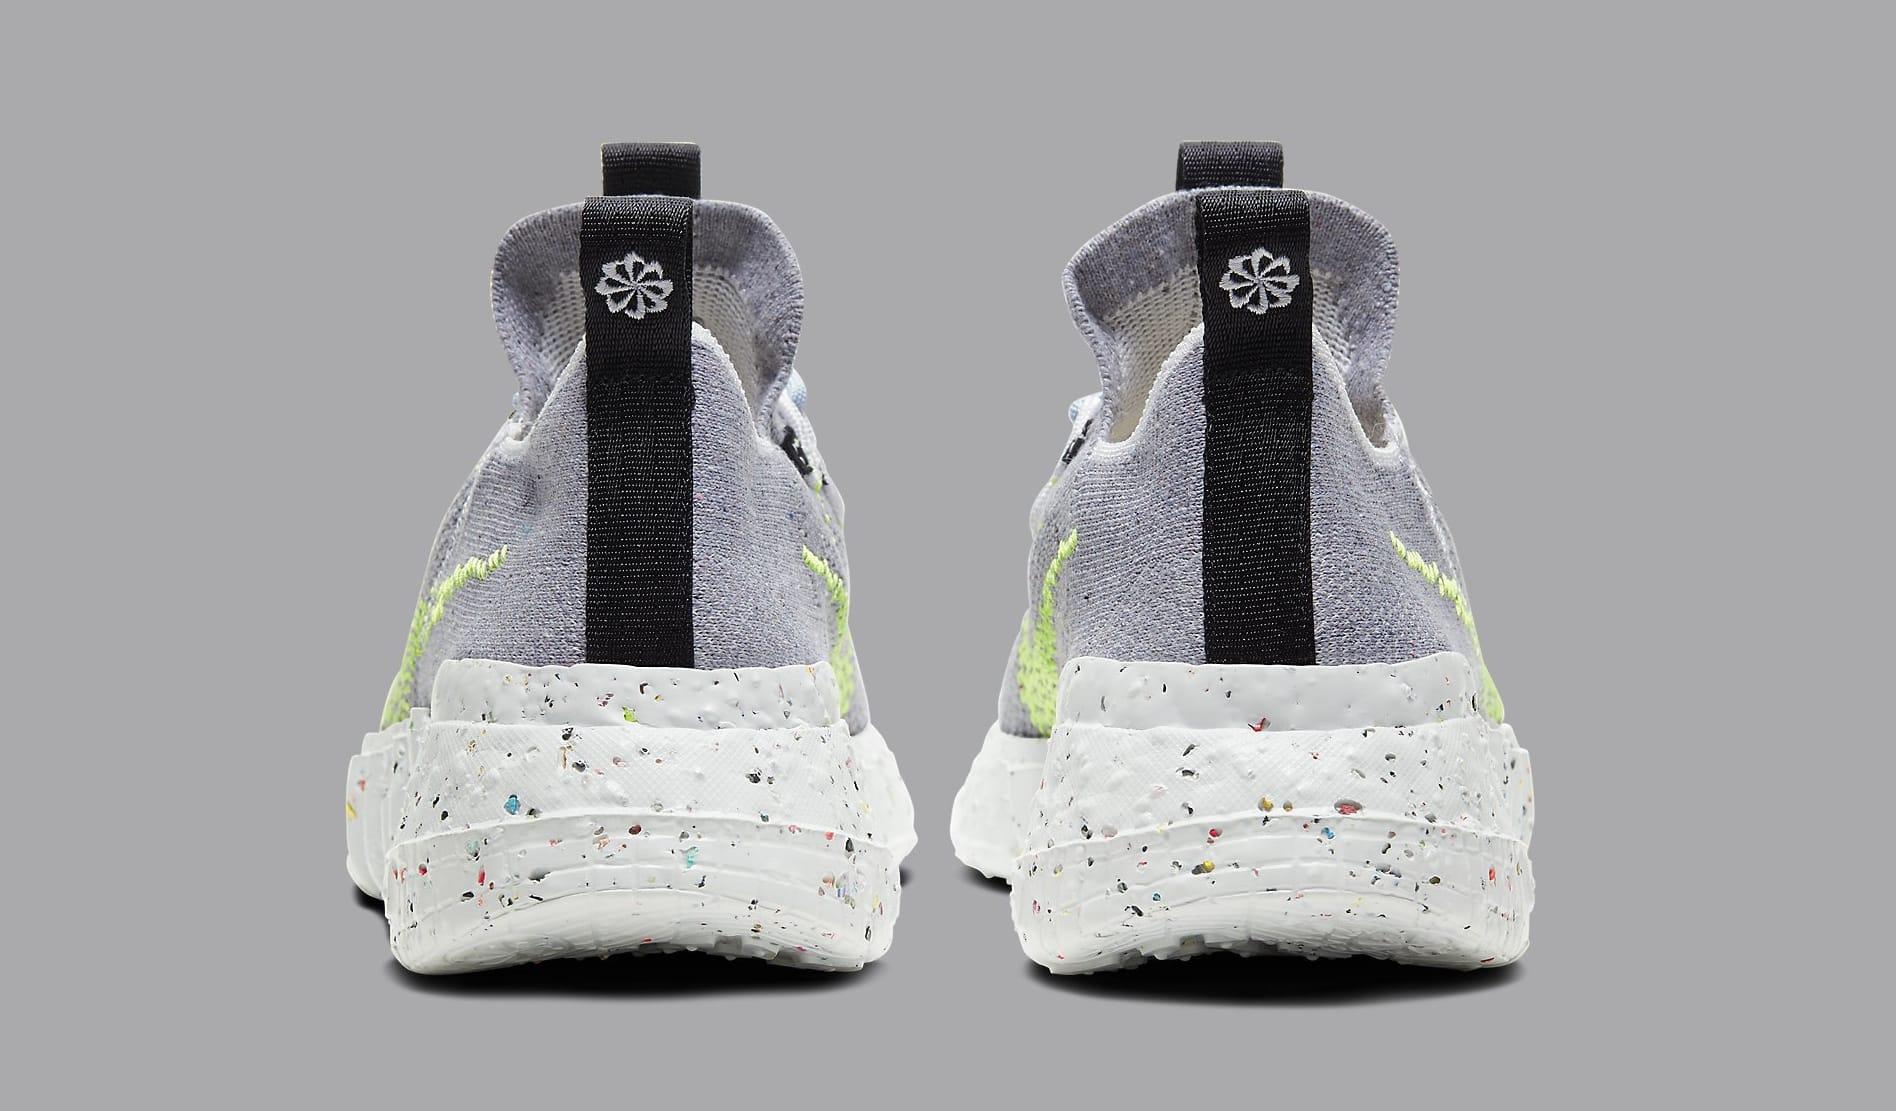 Nike Space Hippie 01 'Grey/Volt' CQ3988-002 Heel